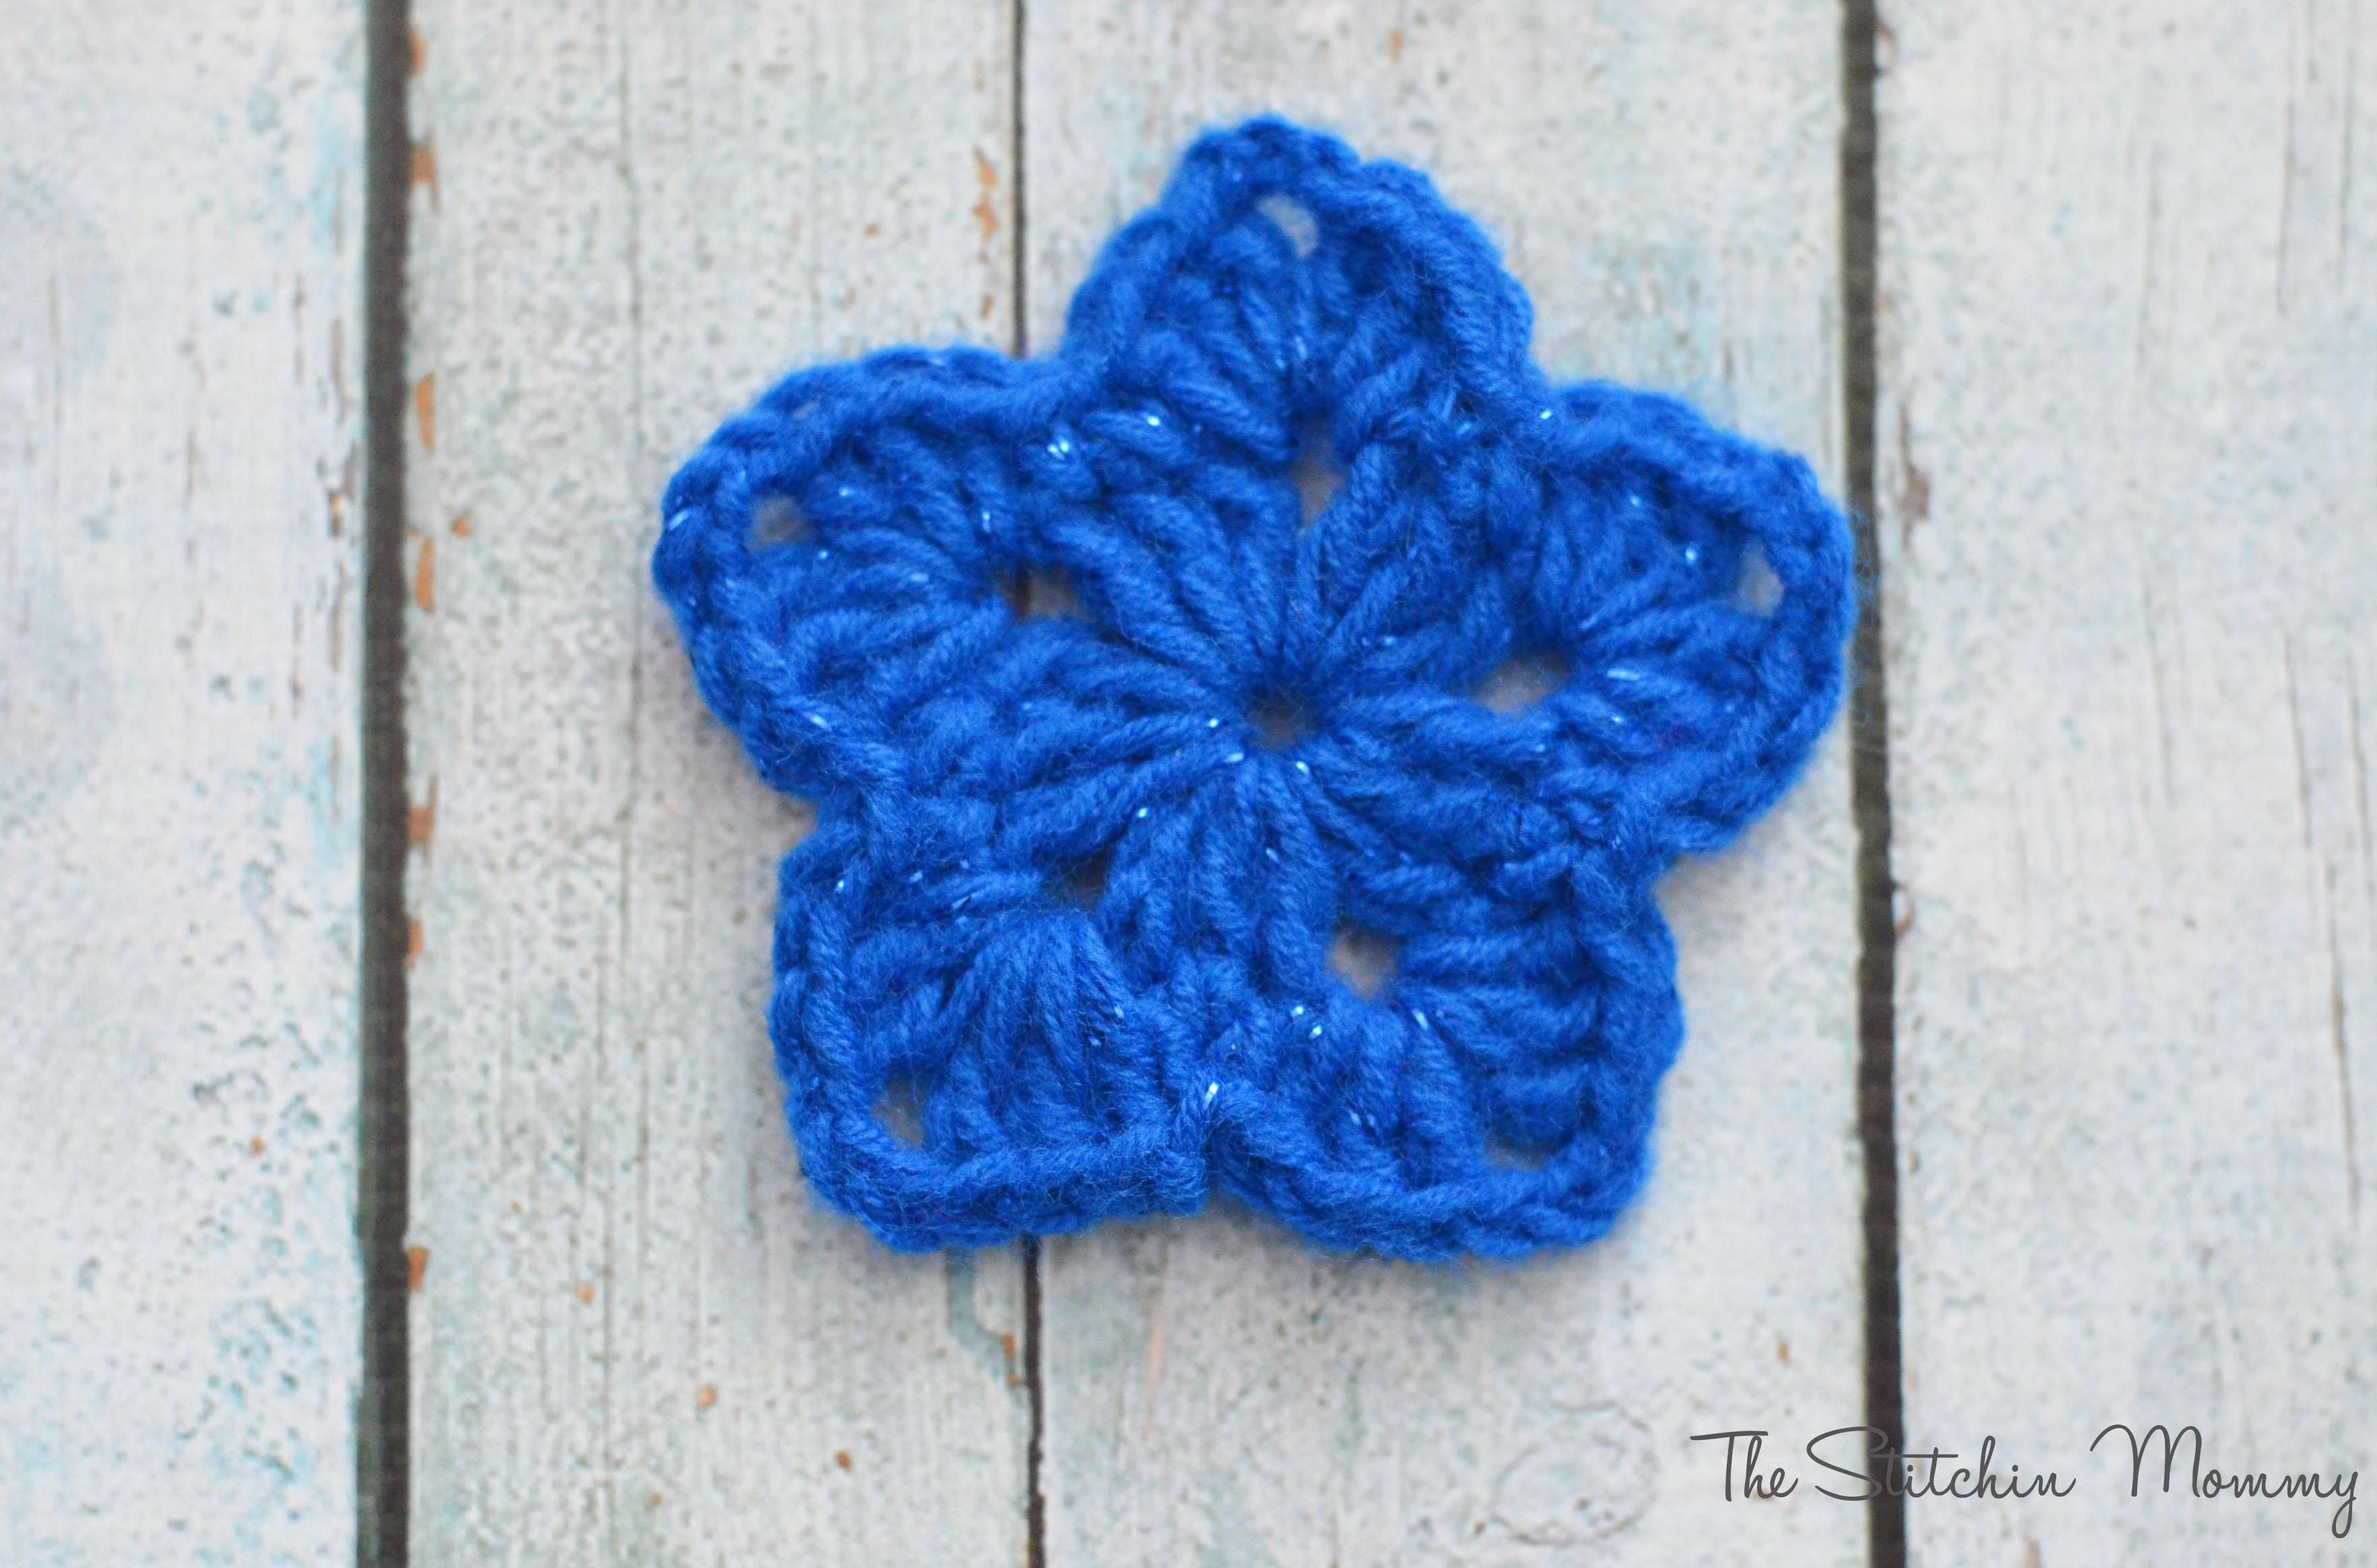 Free Crochet Pattern Granny Star : Crochet Granny Star - The Stitchin Mommy